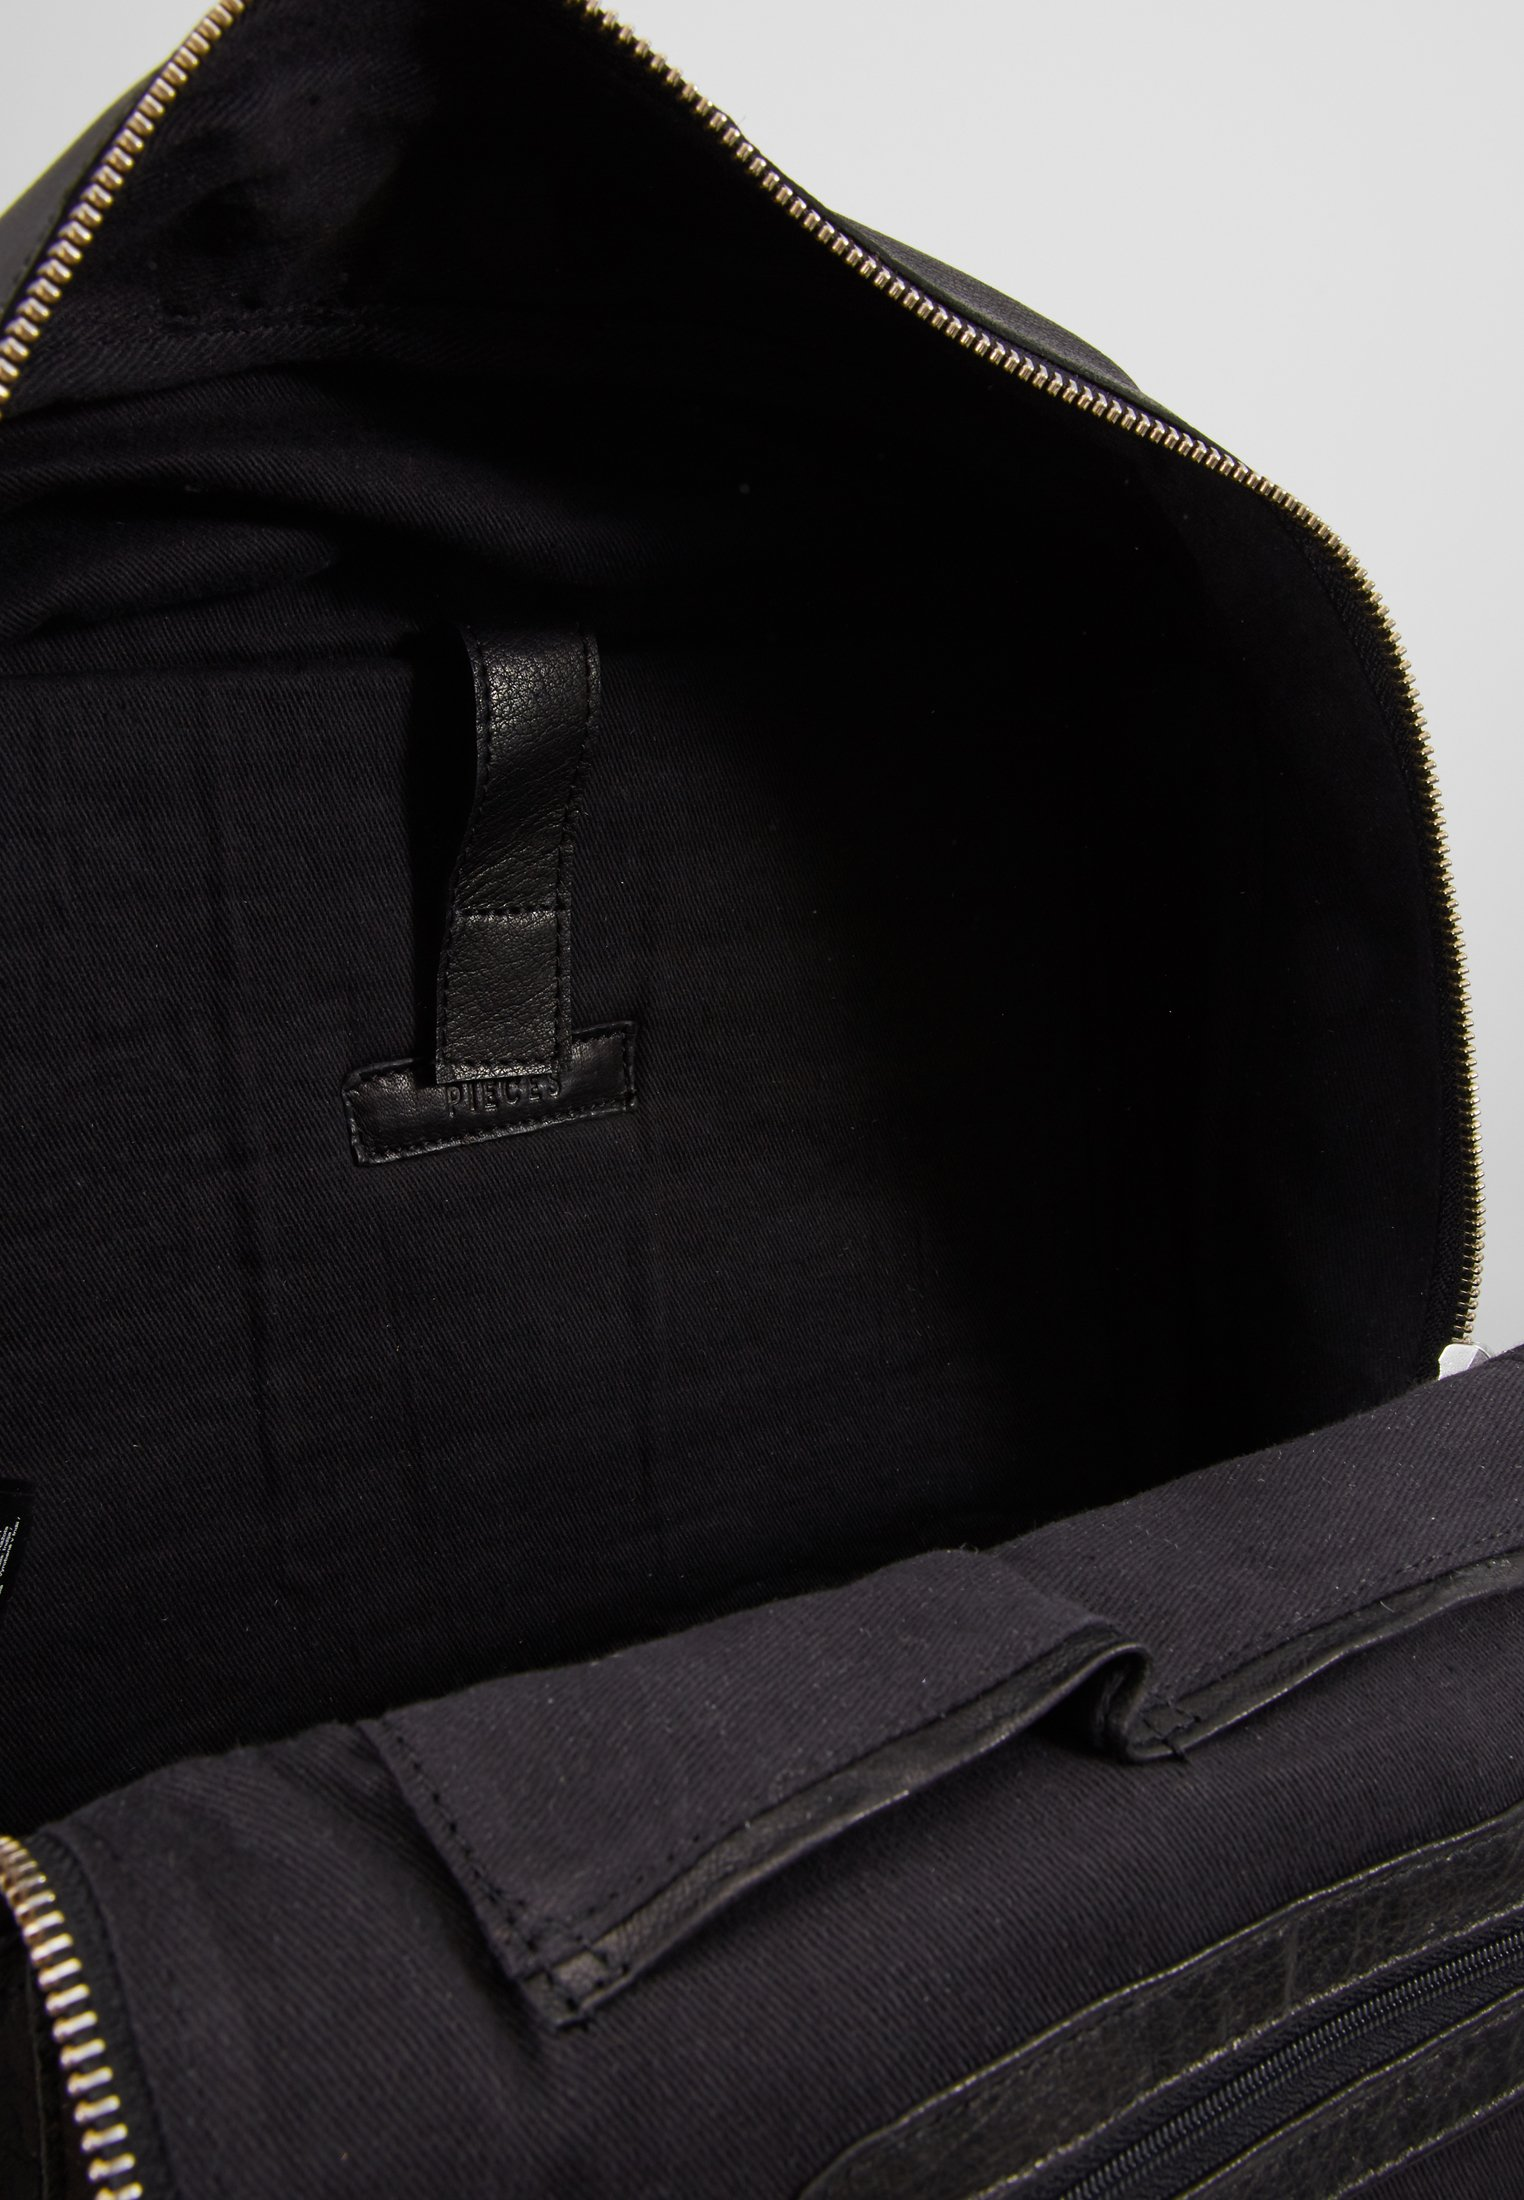 Pieces Tagesrucksack - Black/schwarz